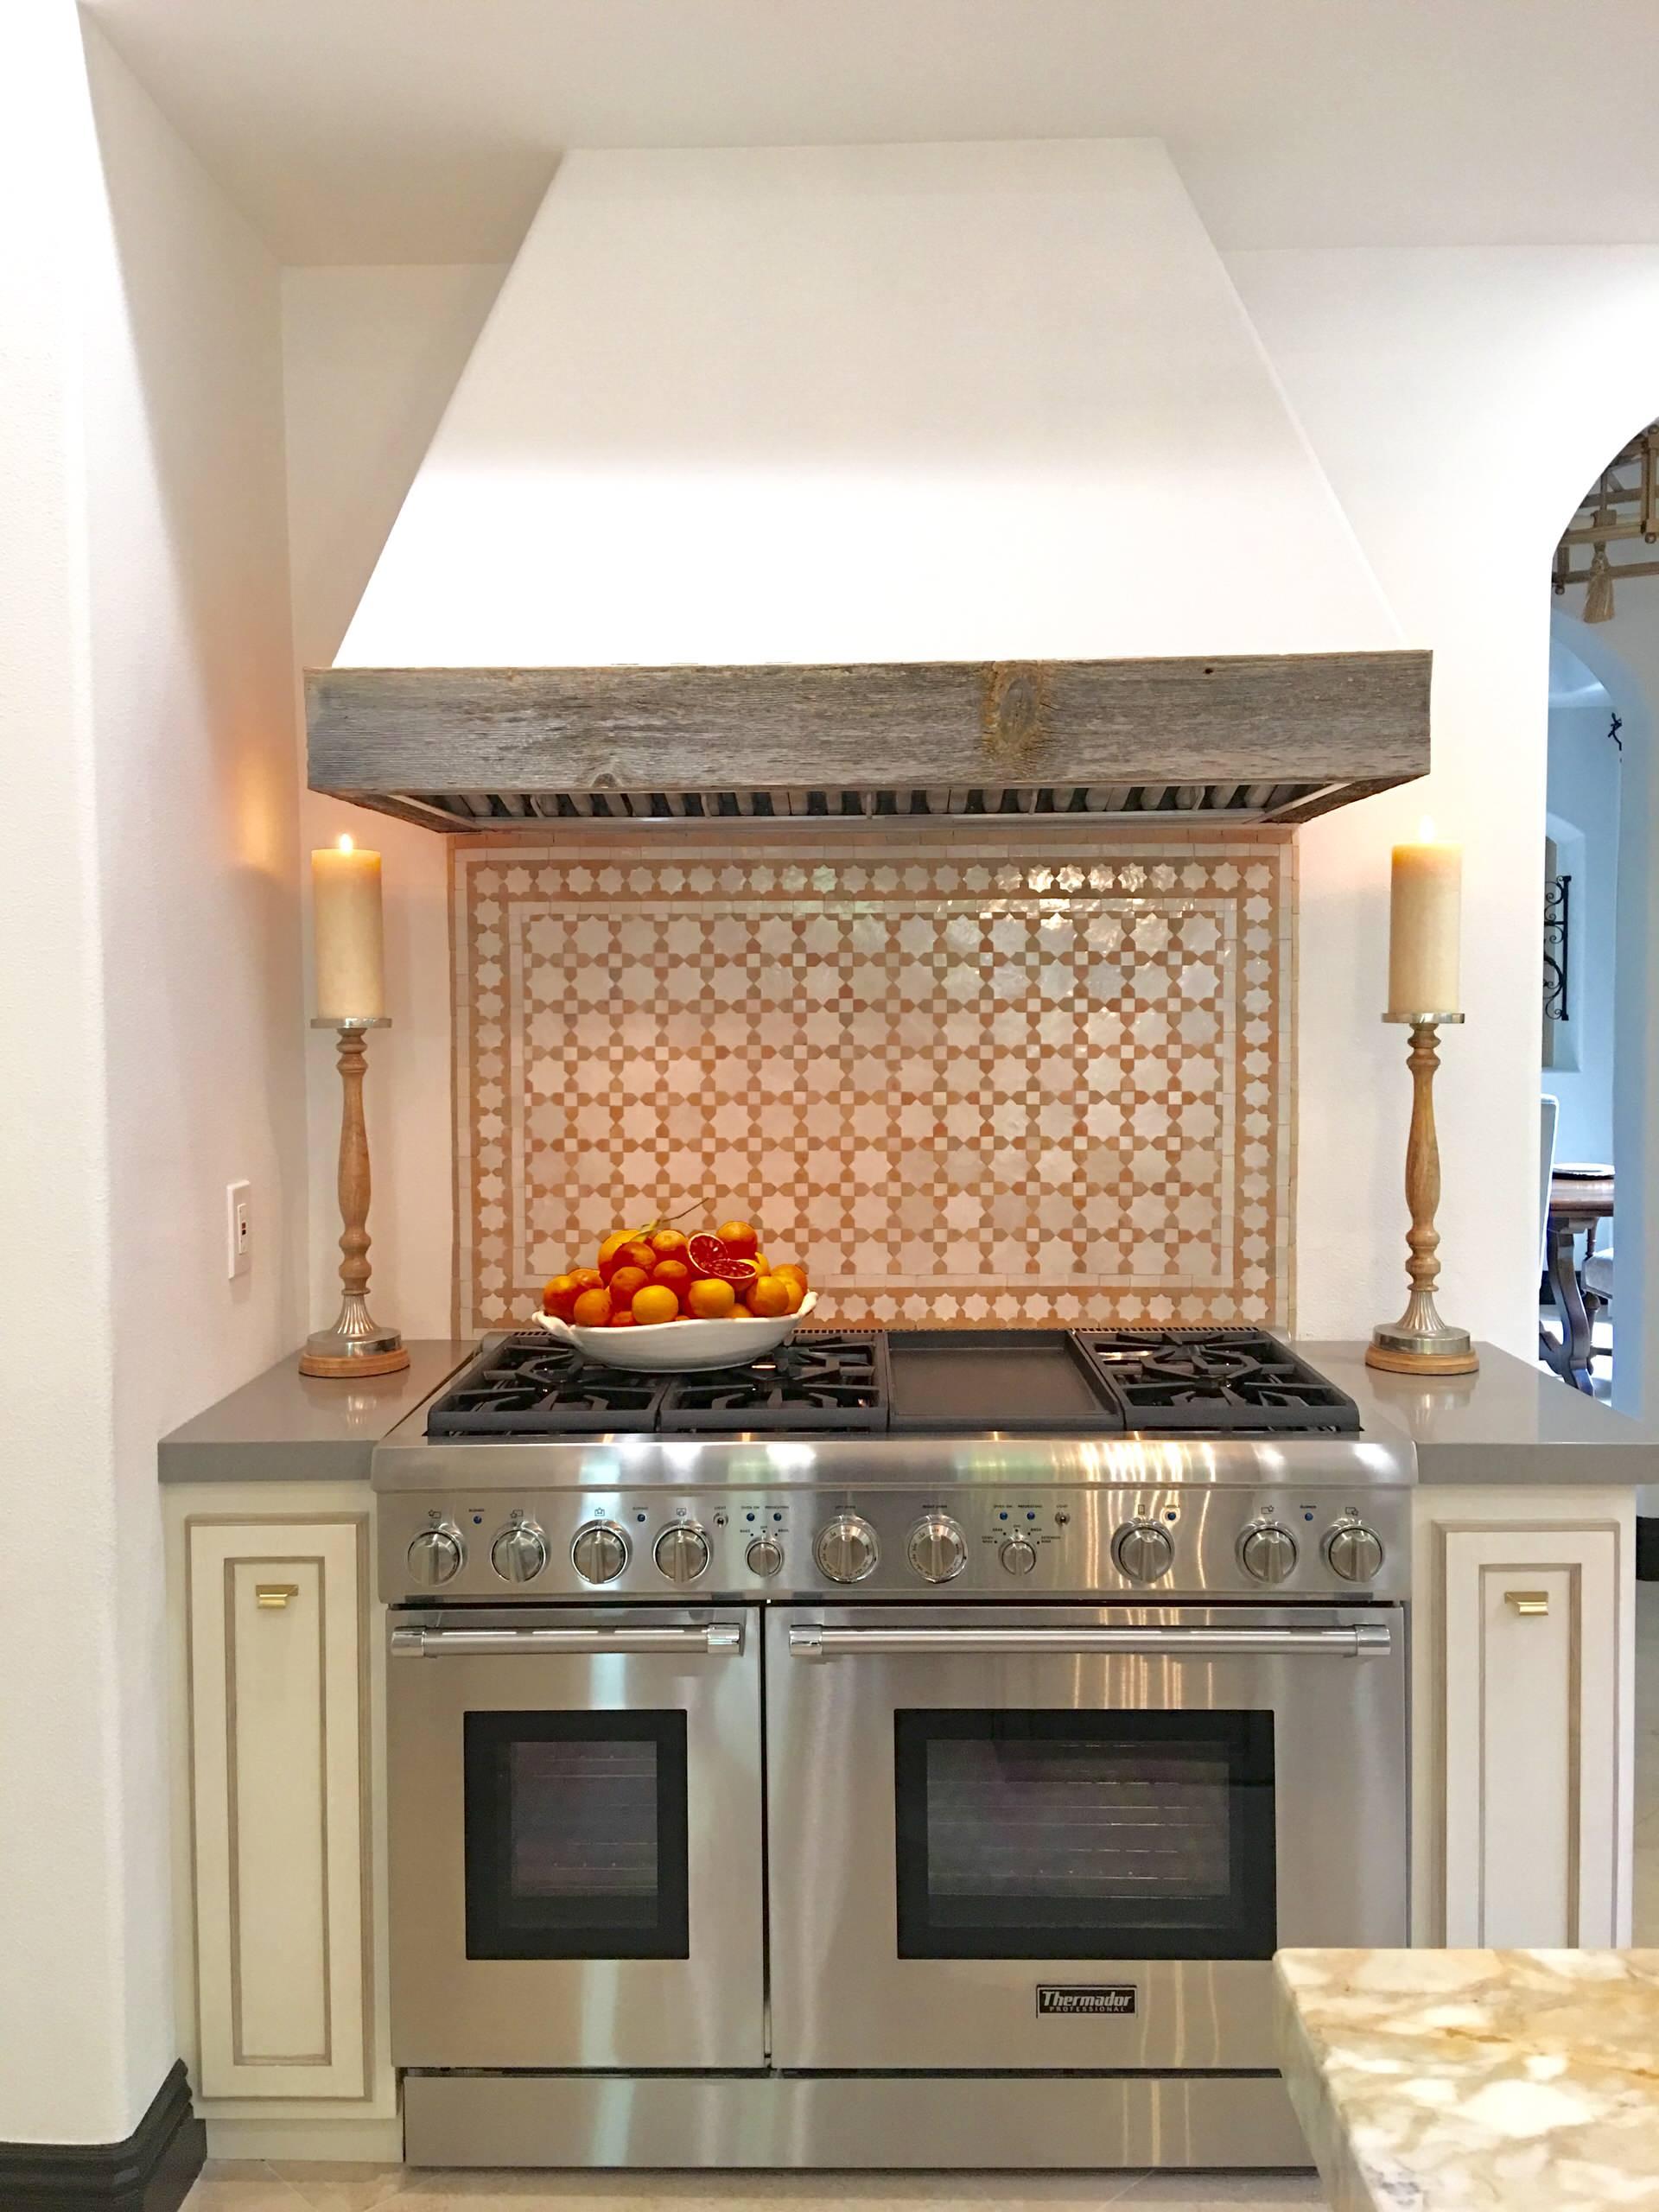 Coto de Caza | Moroccan kitchen